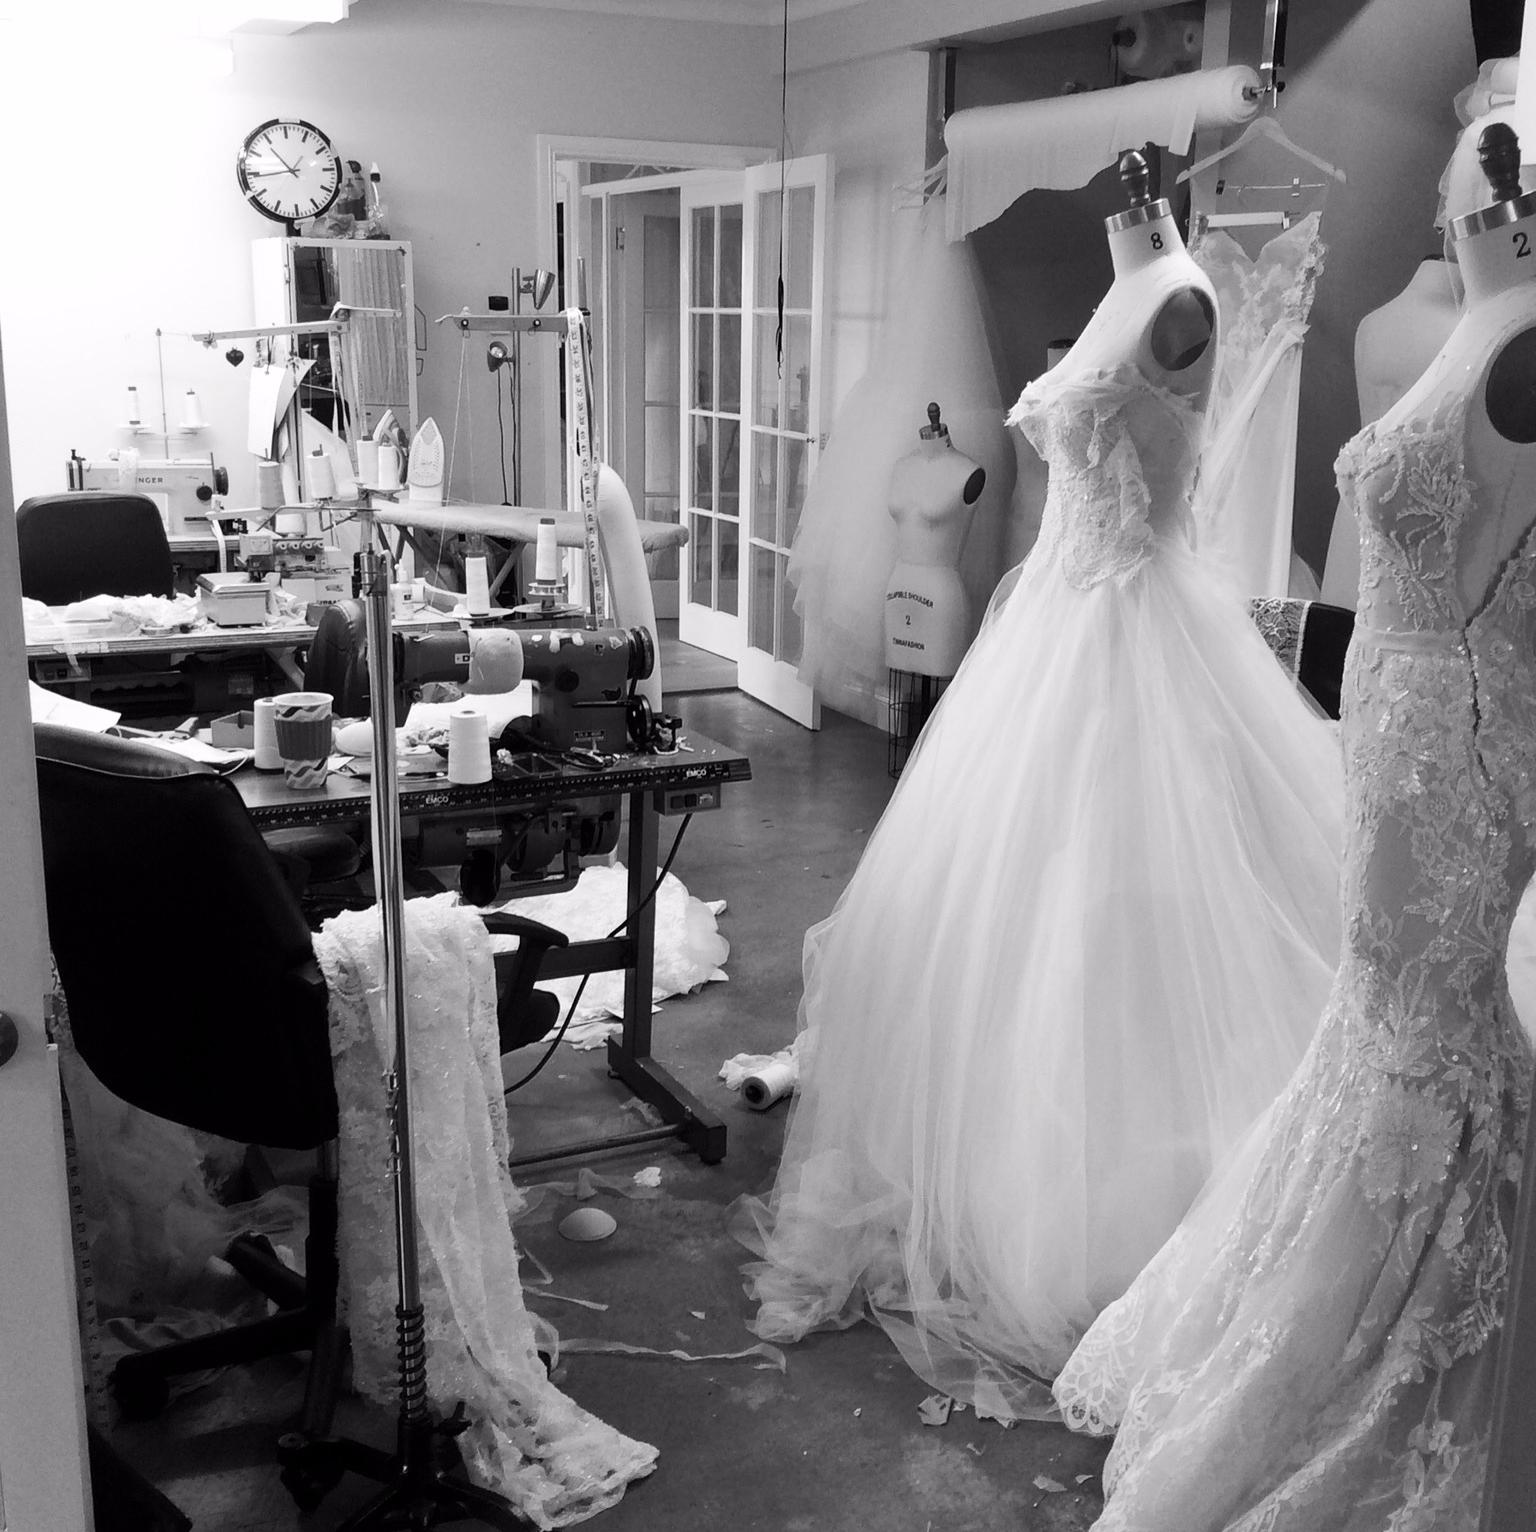 MXM Couture Weddding Dress Studio Behind The Scenes Yesterday Creative Letterpress Blog Post